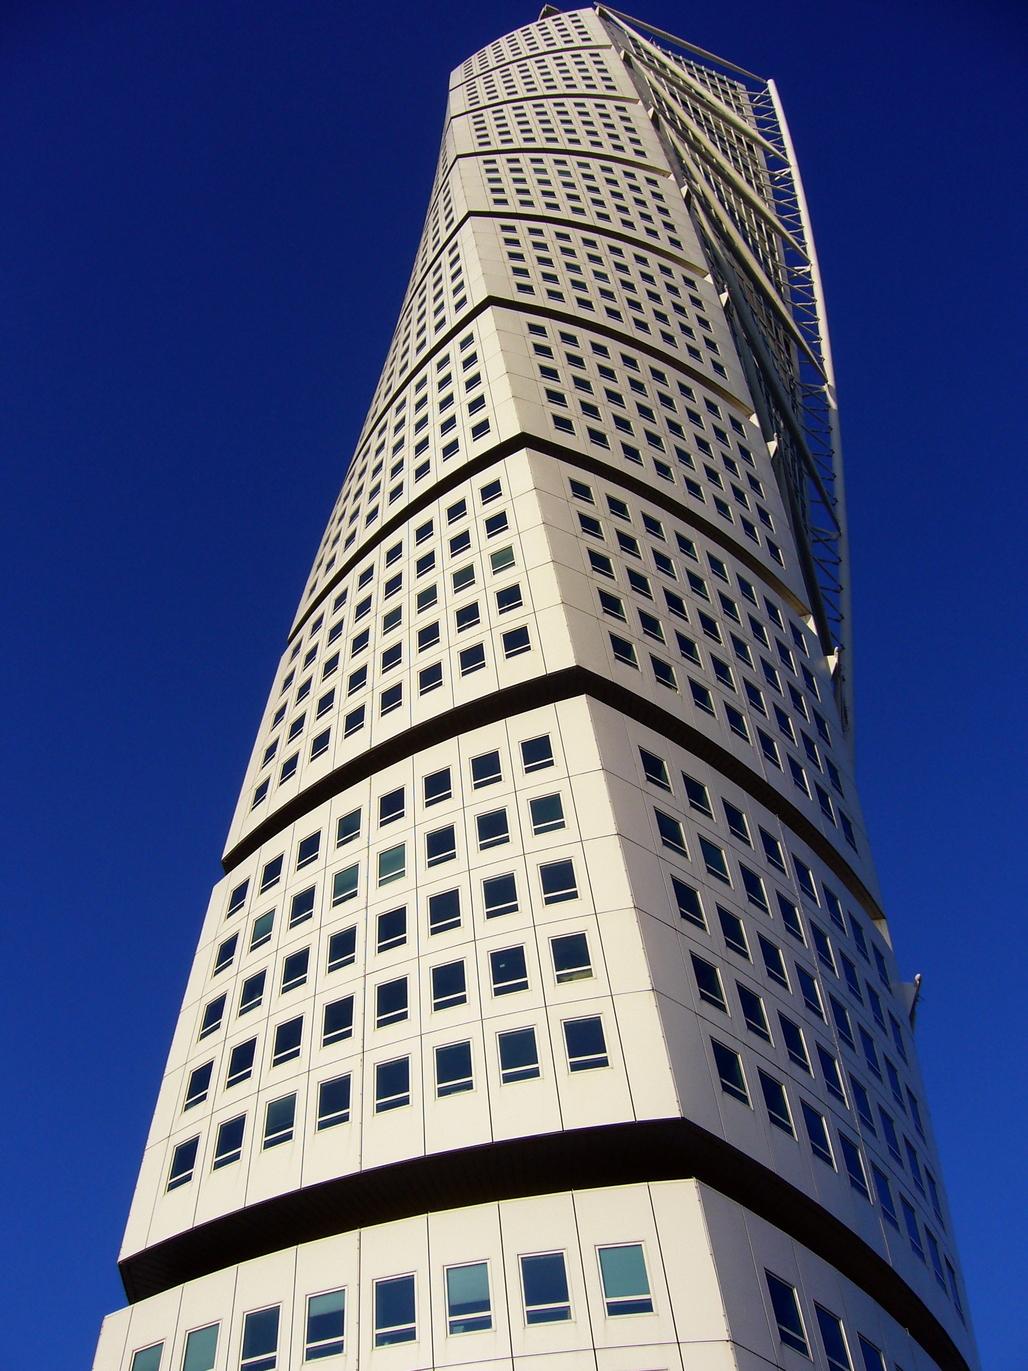 Santiago Calatrava's Turning Torso (via Wikipedia).